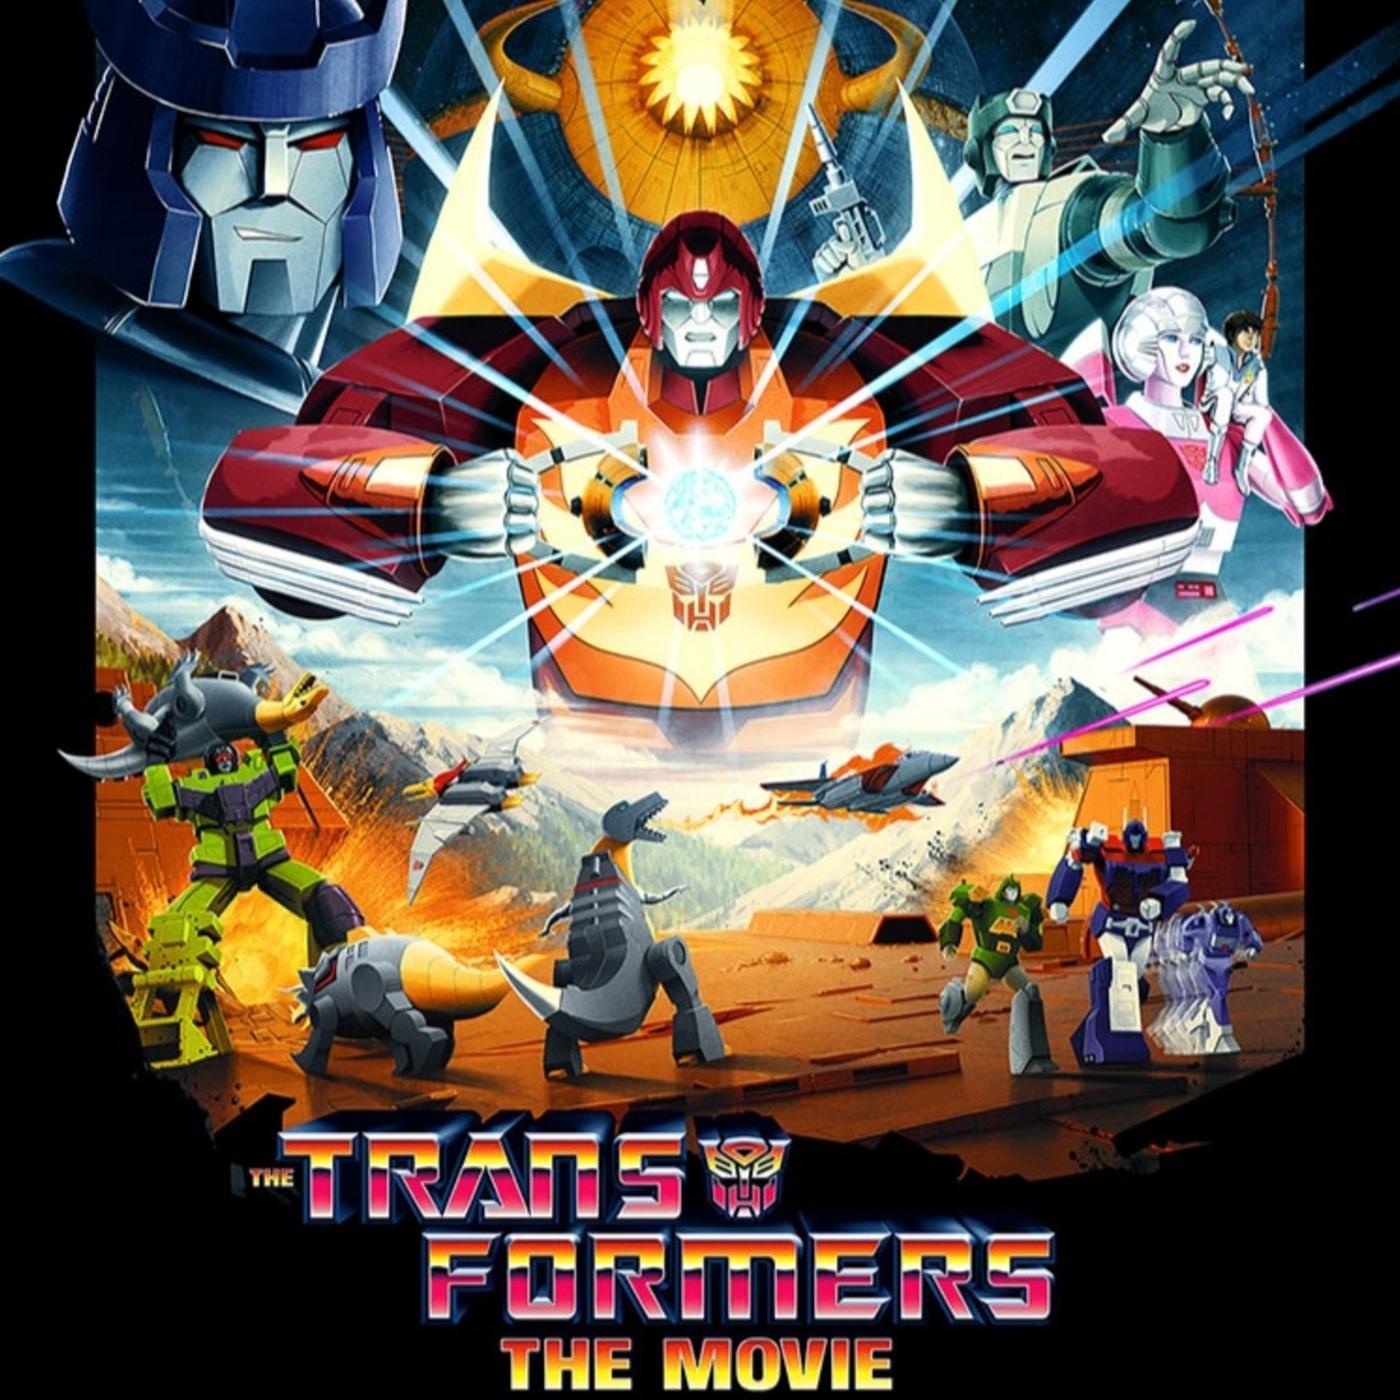 Comic Book Rundown rundownreviews24: Rundown Reviews #24 - The Transformers: The Movie 1986